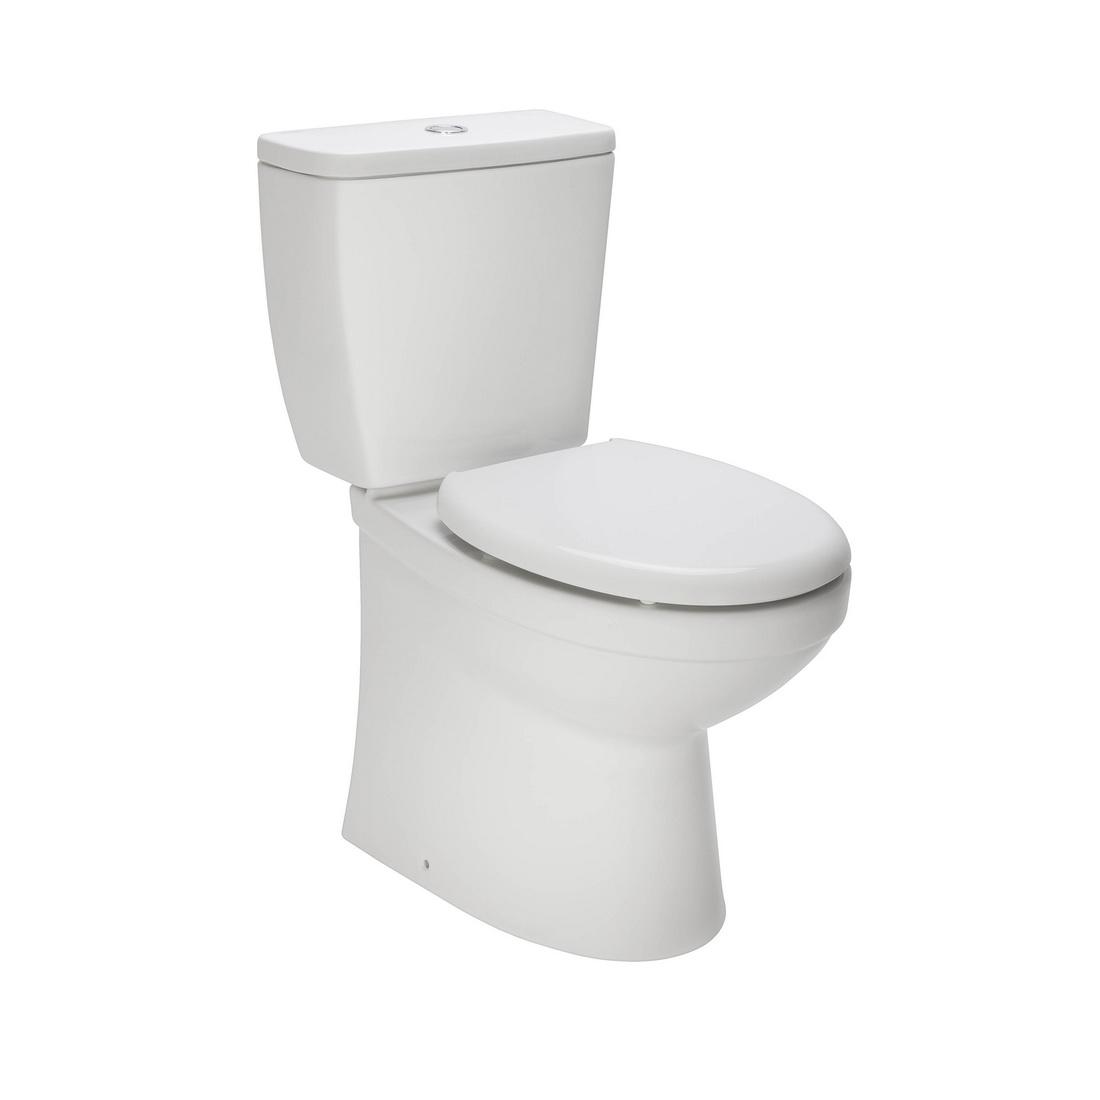 Valencia Close Coupled Toilet Suite 825 x 375 x 665mm White